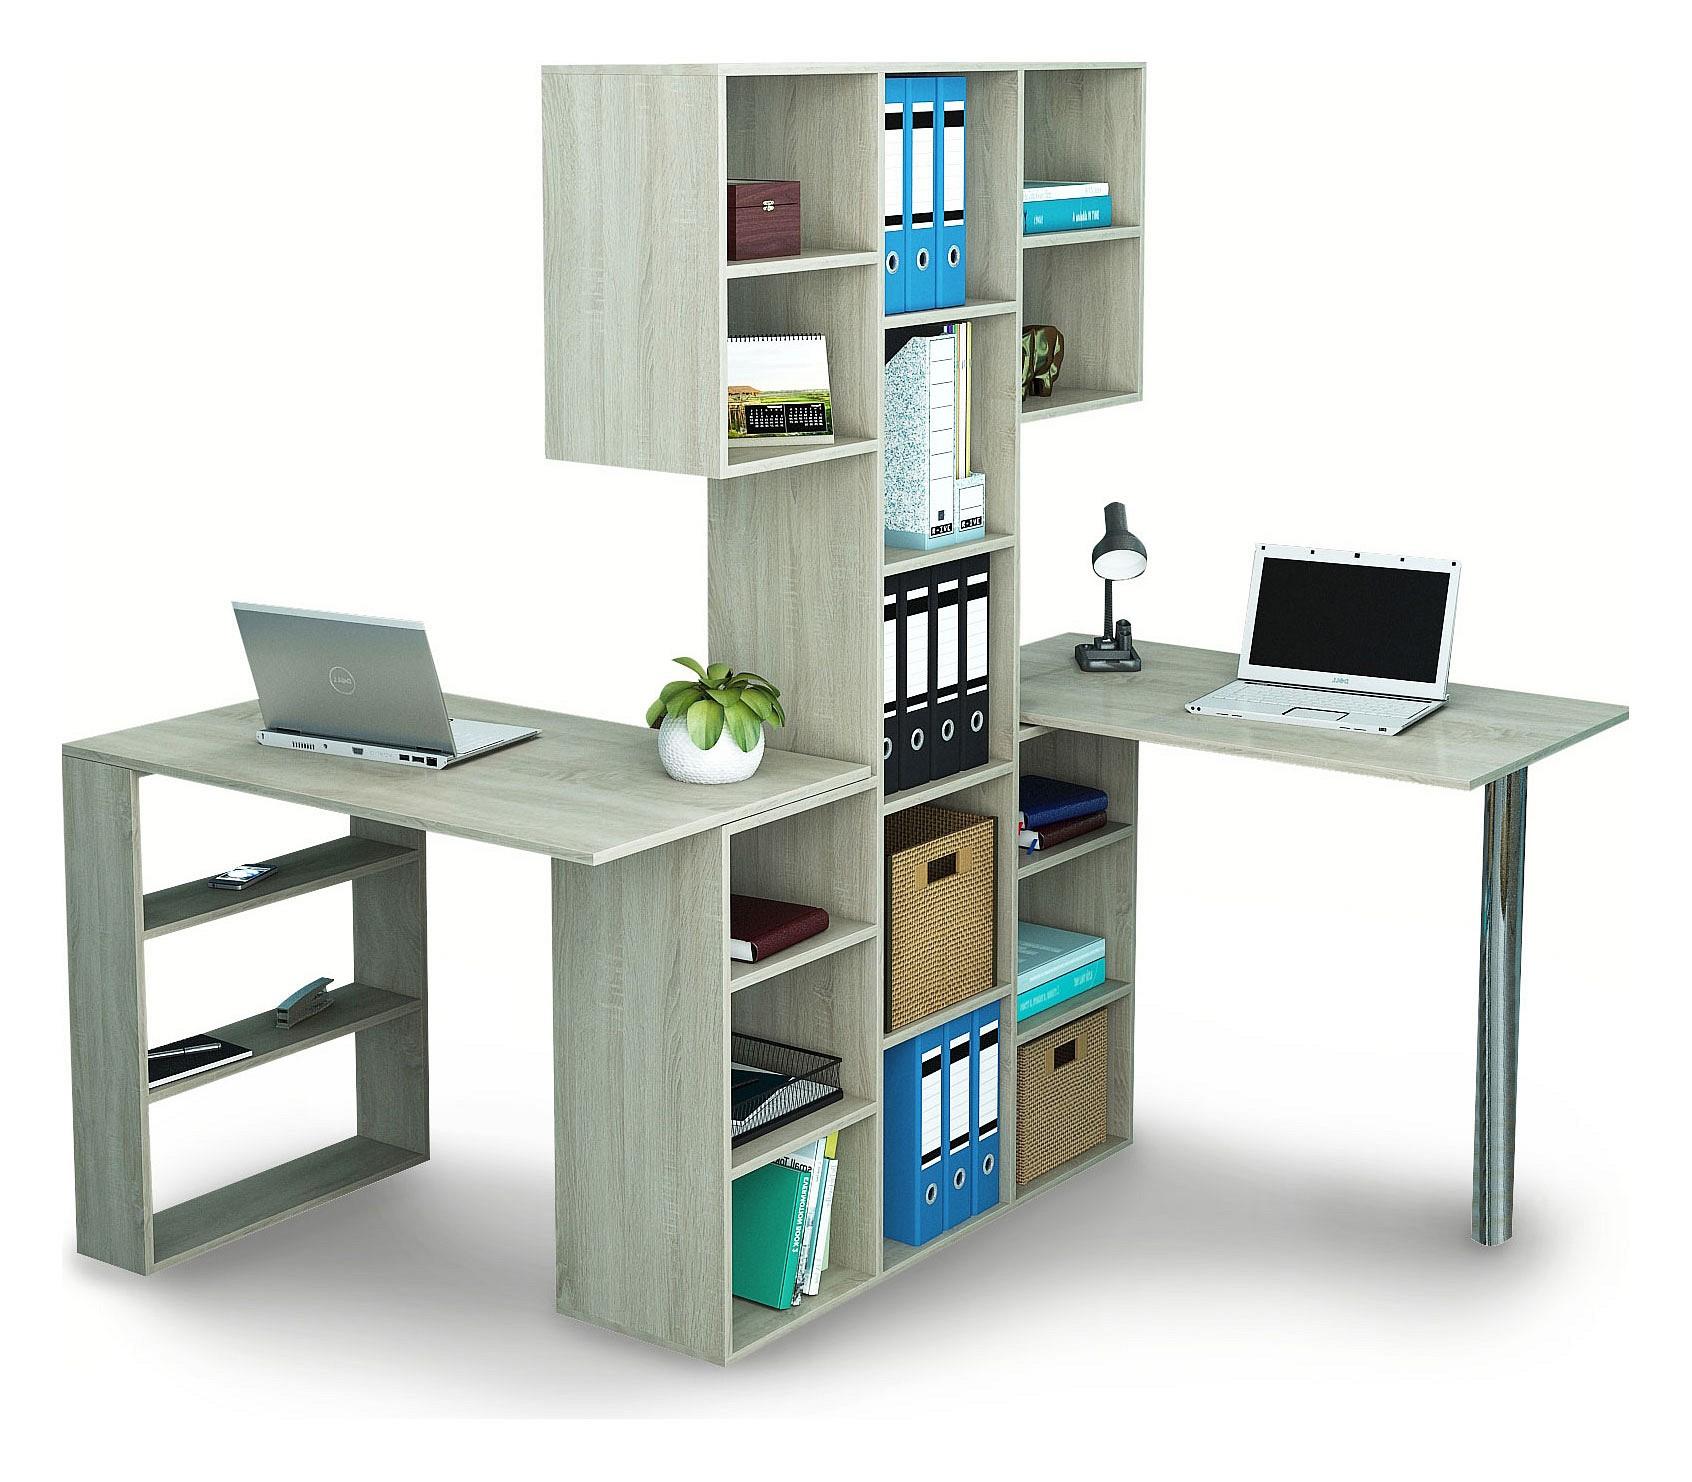 Компьютерные столы (йошкар-ола) на all-home-shops.ru.